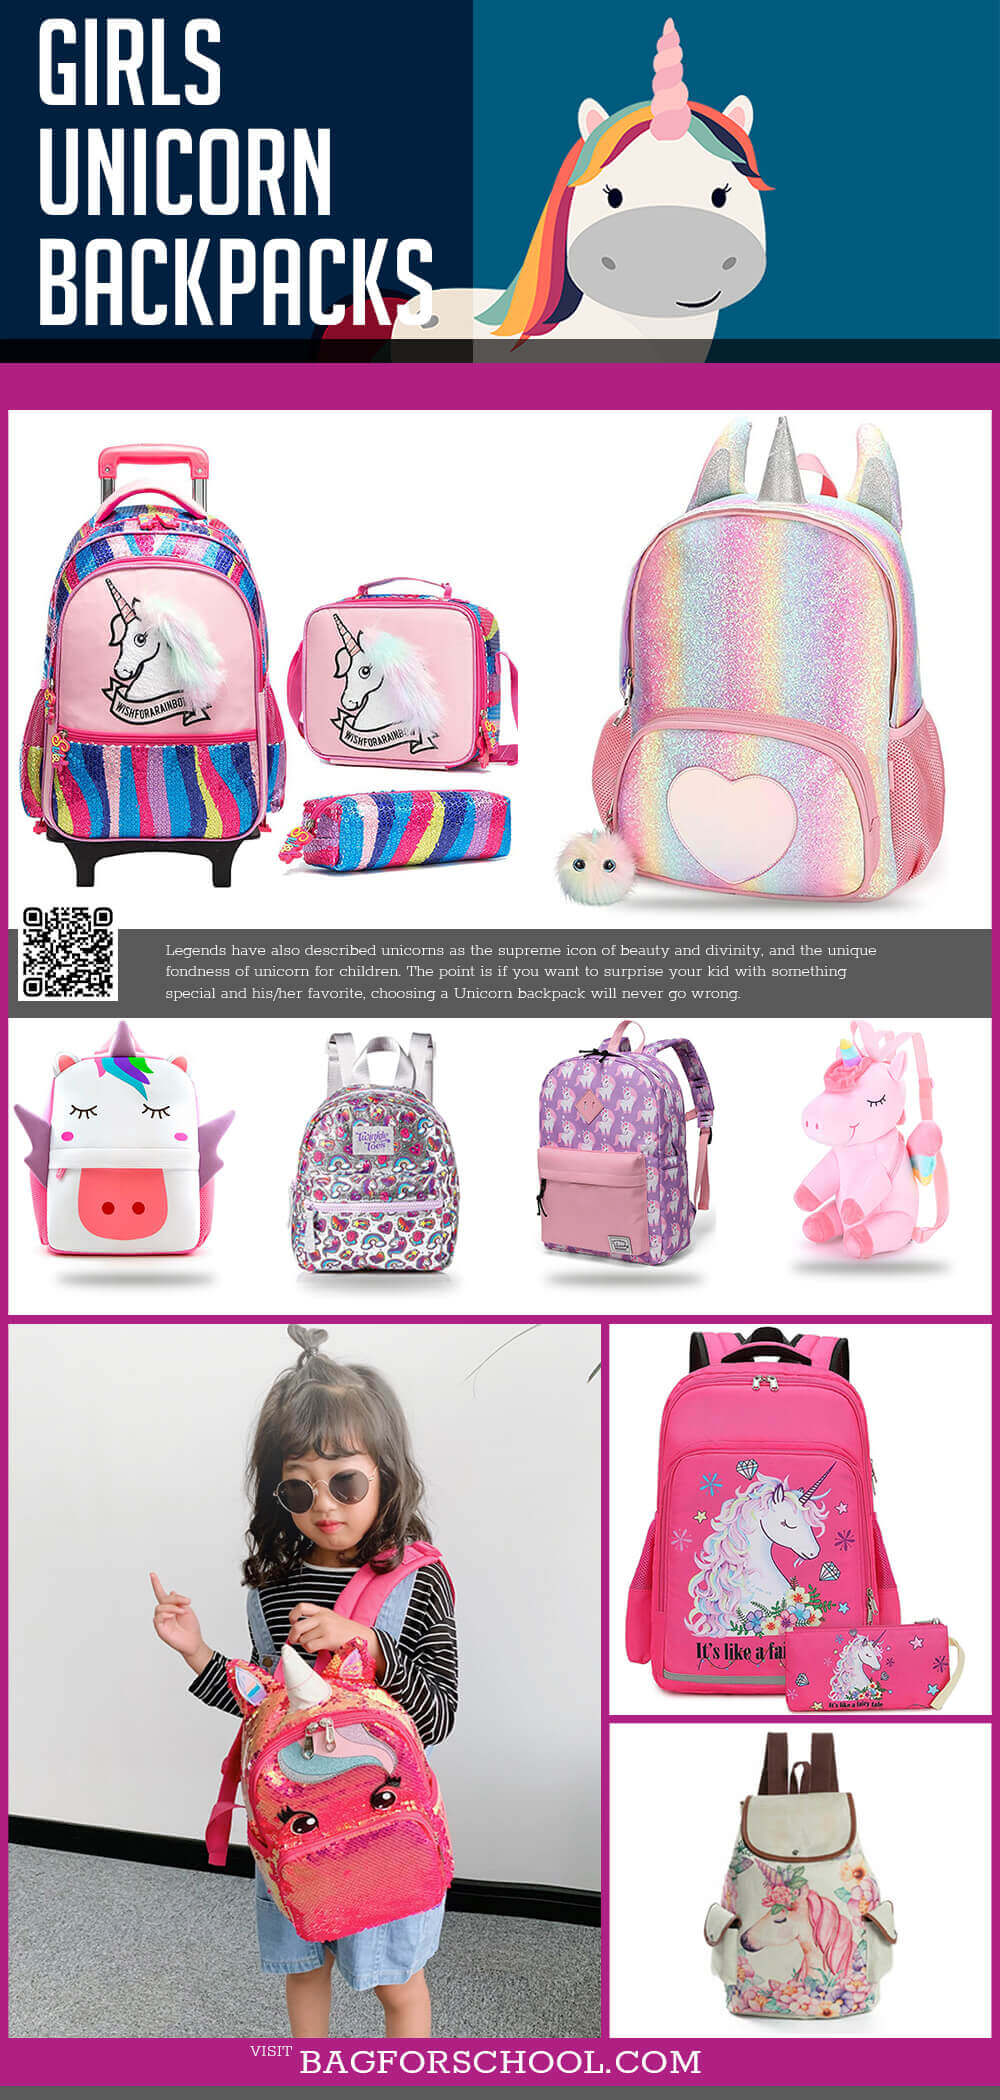 Girls Unicorn Backpacks